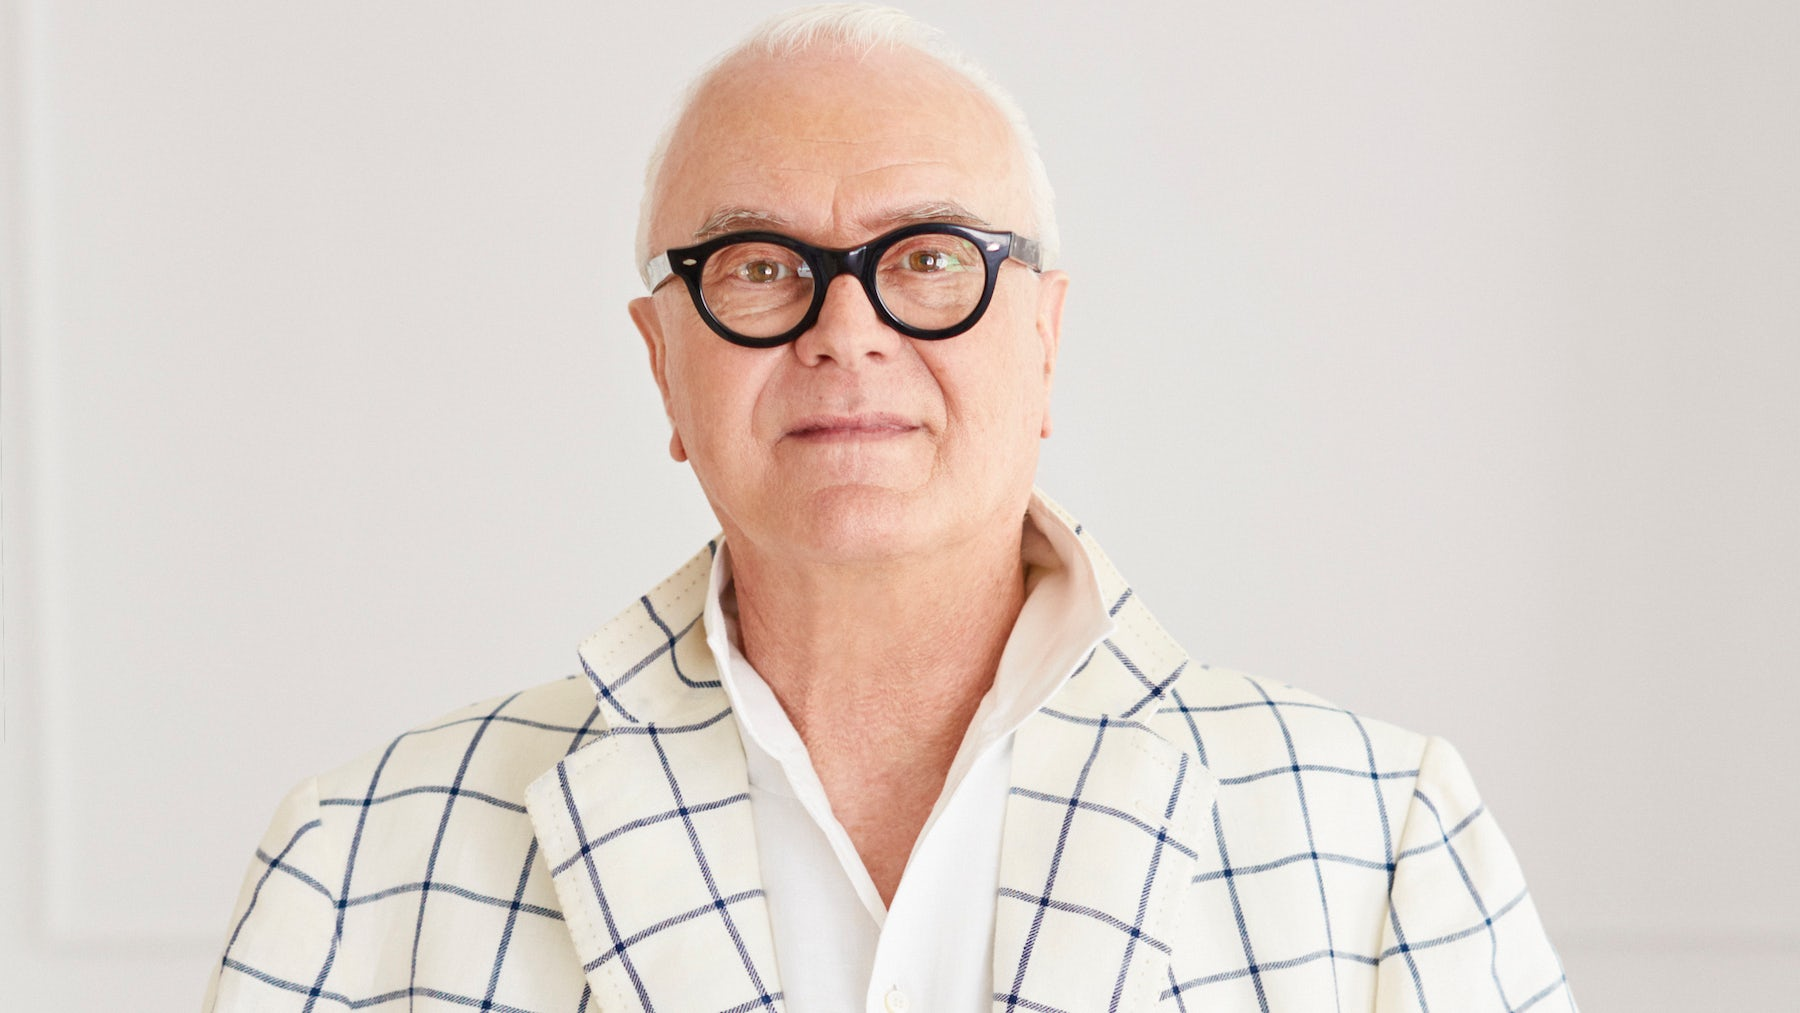 Manolo Blahnik Bets on Men's Shoes